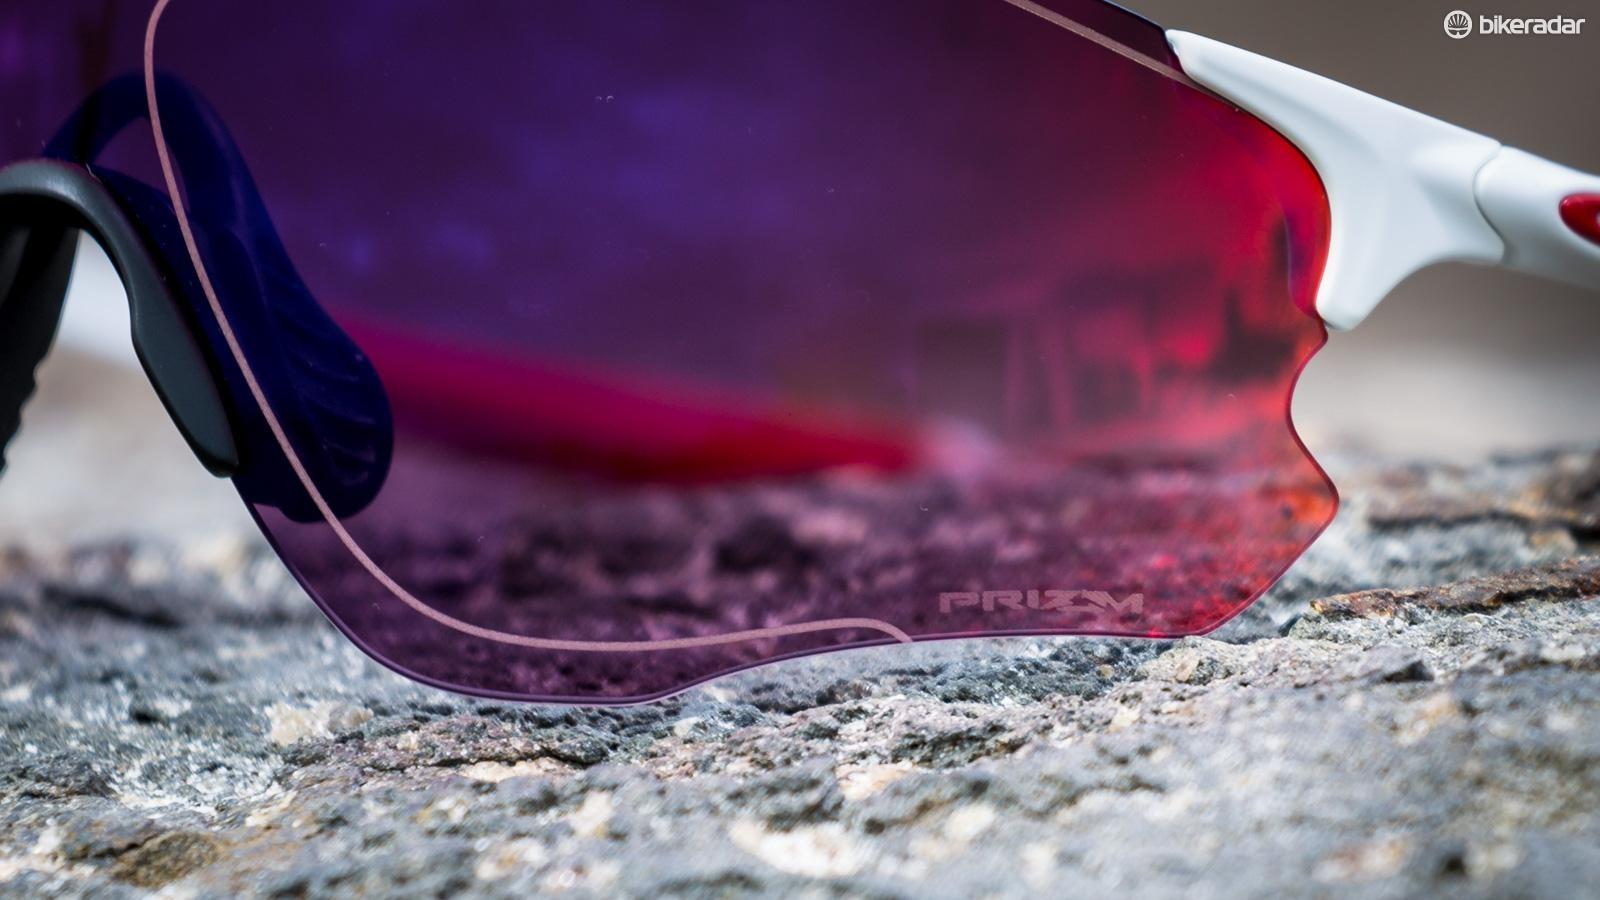 a25a7ed3cc4 Oakley EVZero sports glasses review - BikeRadar